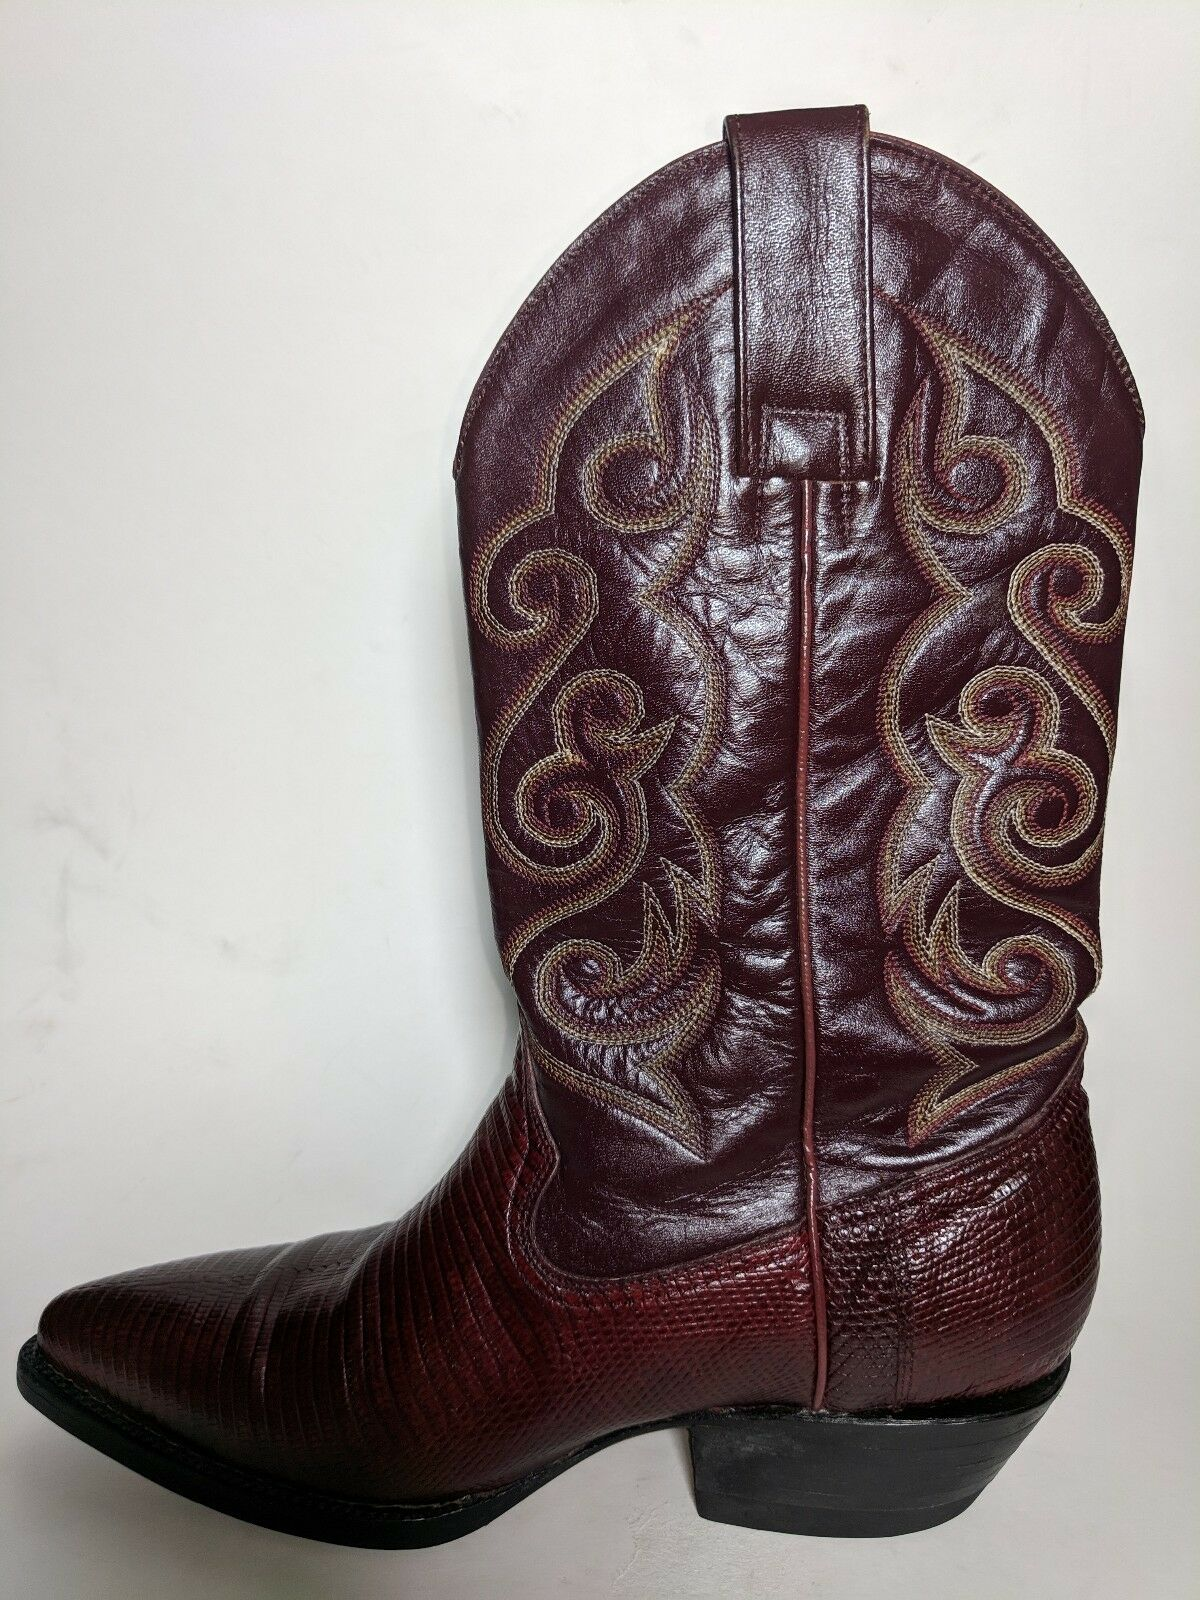 Pistolero Red Leather Lizard  Skin Cowboy Boots Men Sz 6.5 US EUC  counter genuine